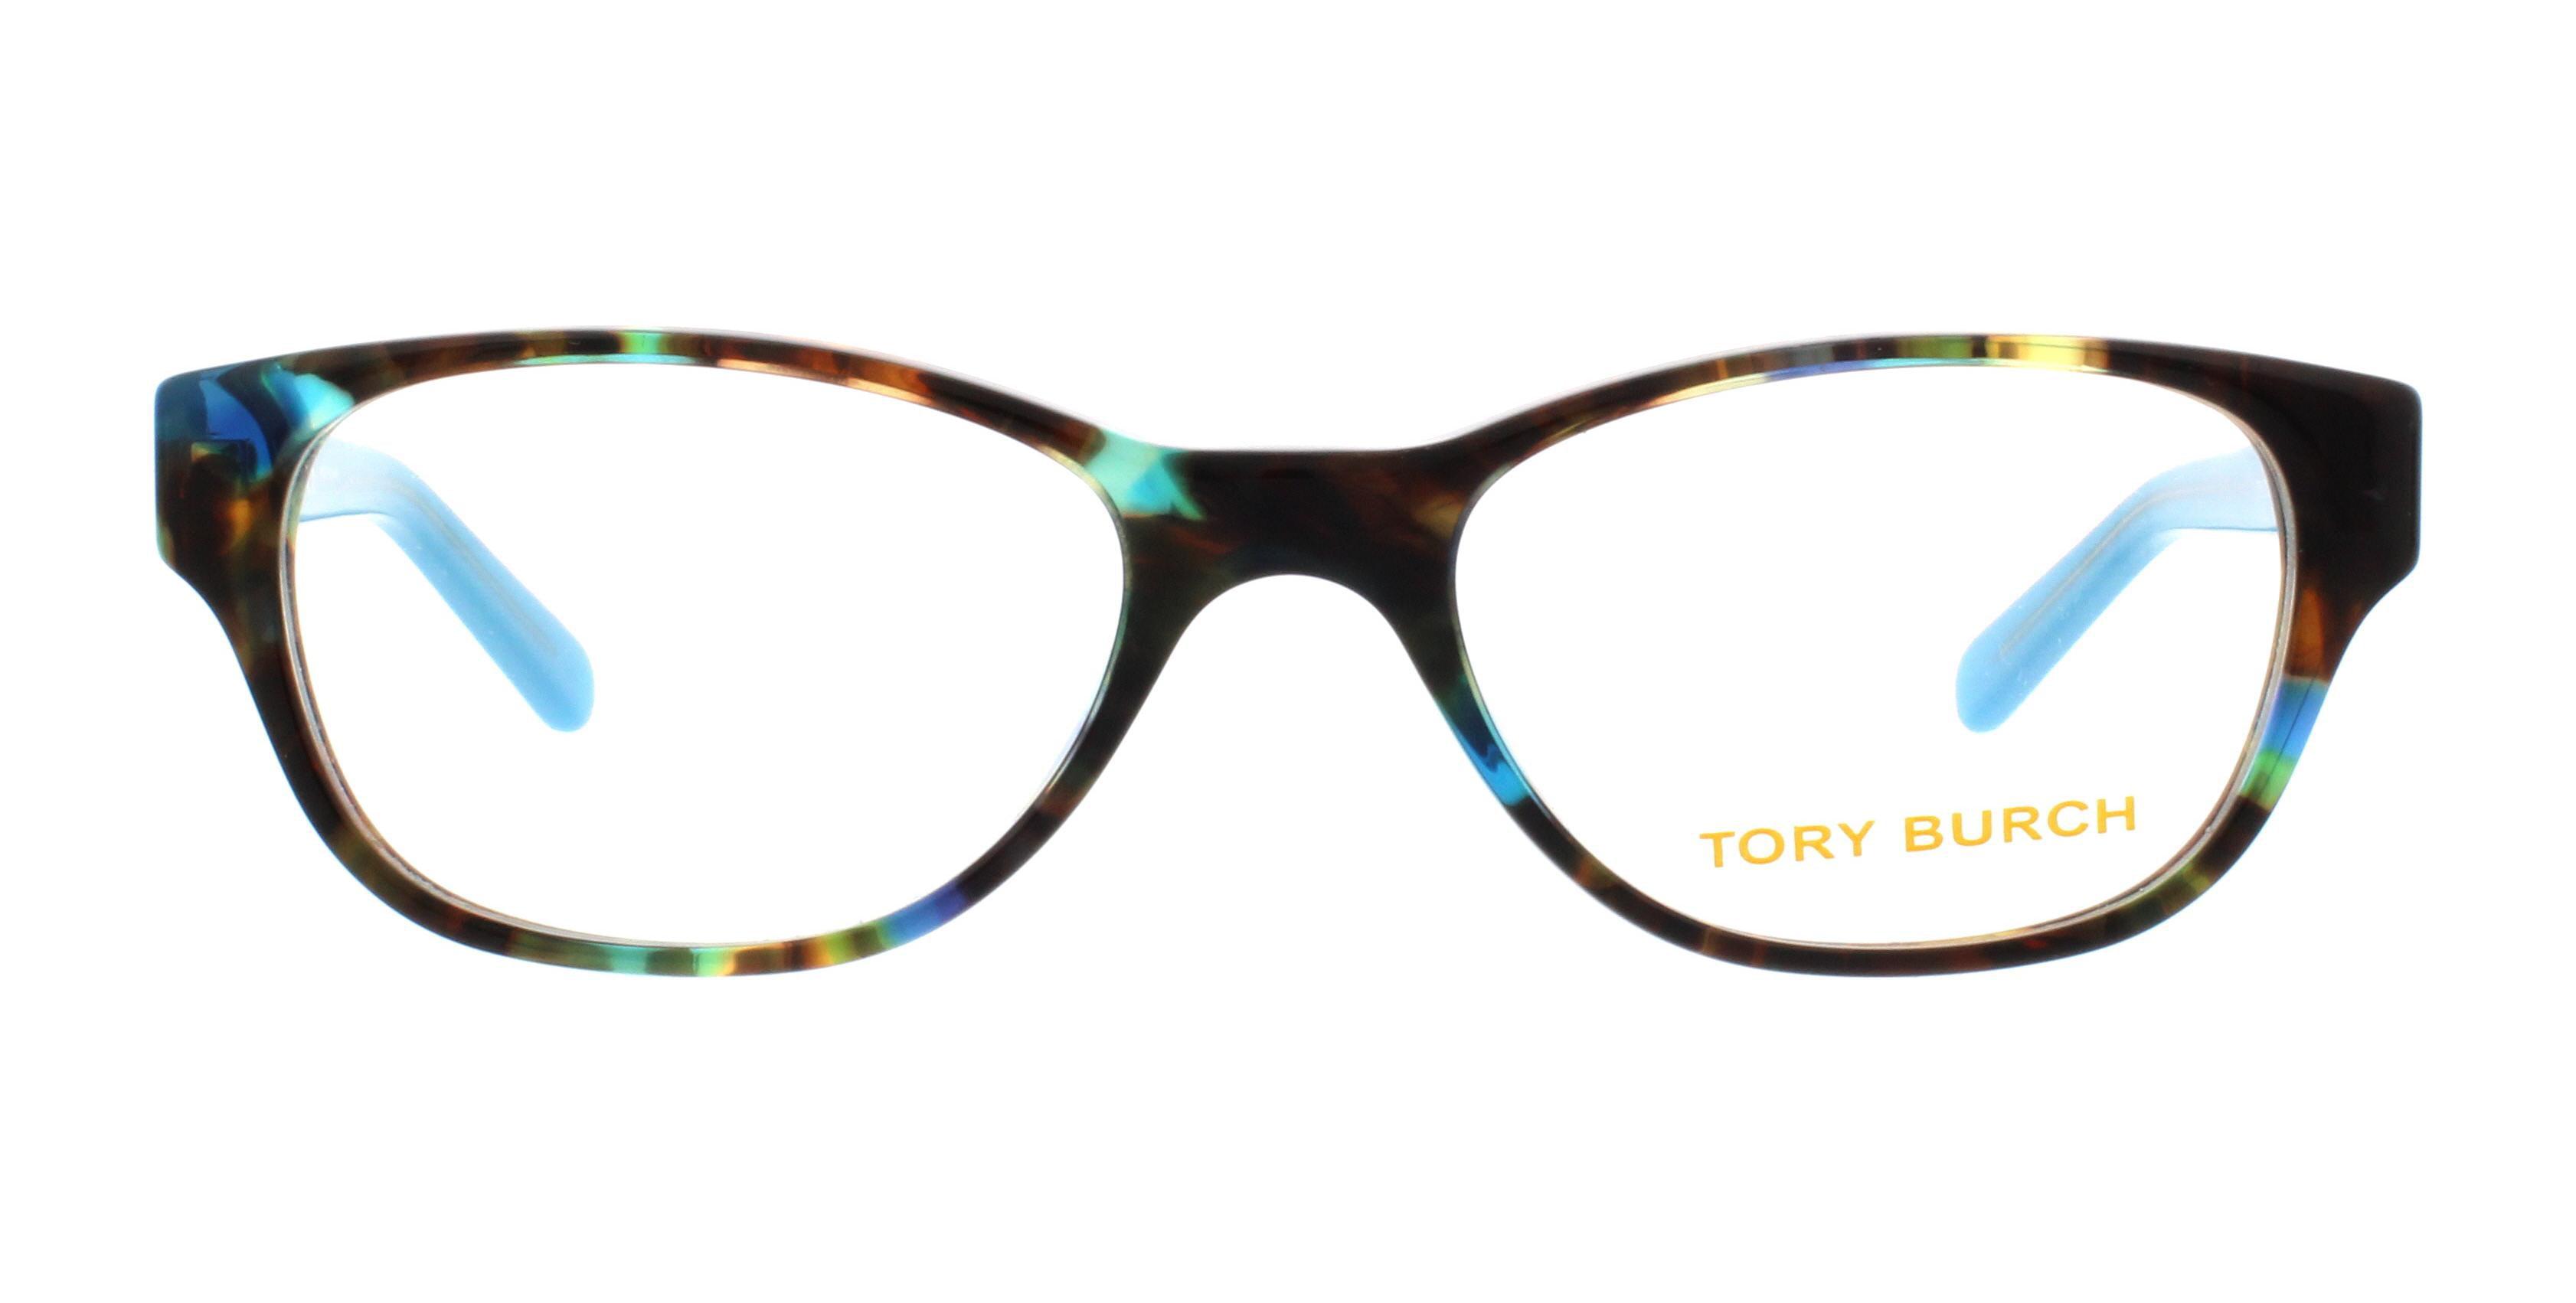 6a57ea1f61 Tory Burch - TORY BURCH Eyeglasses TY2031 3153 Blue Brown Tortoise Blue  Lark 49MM - Walmart.com